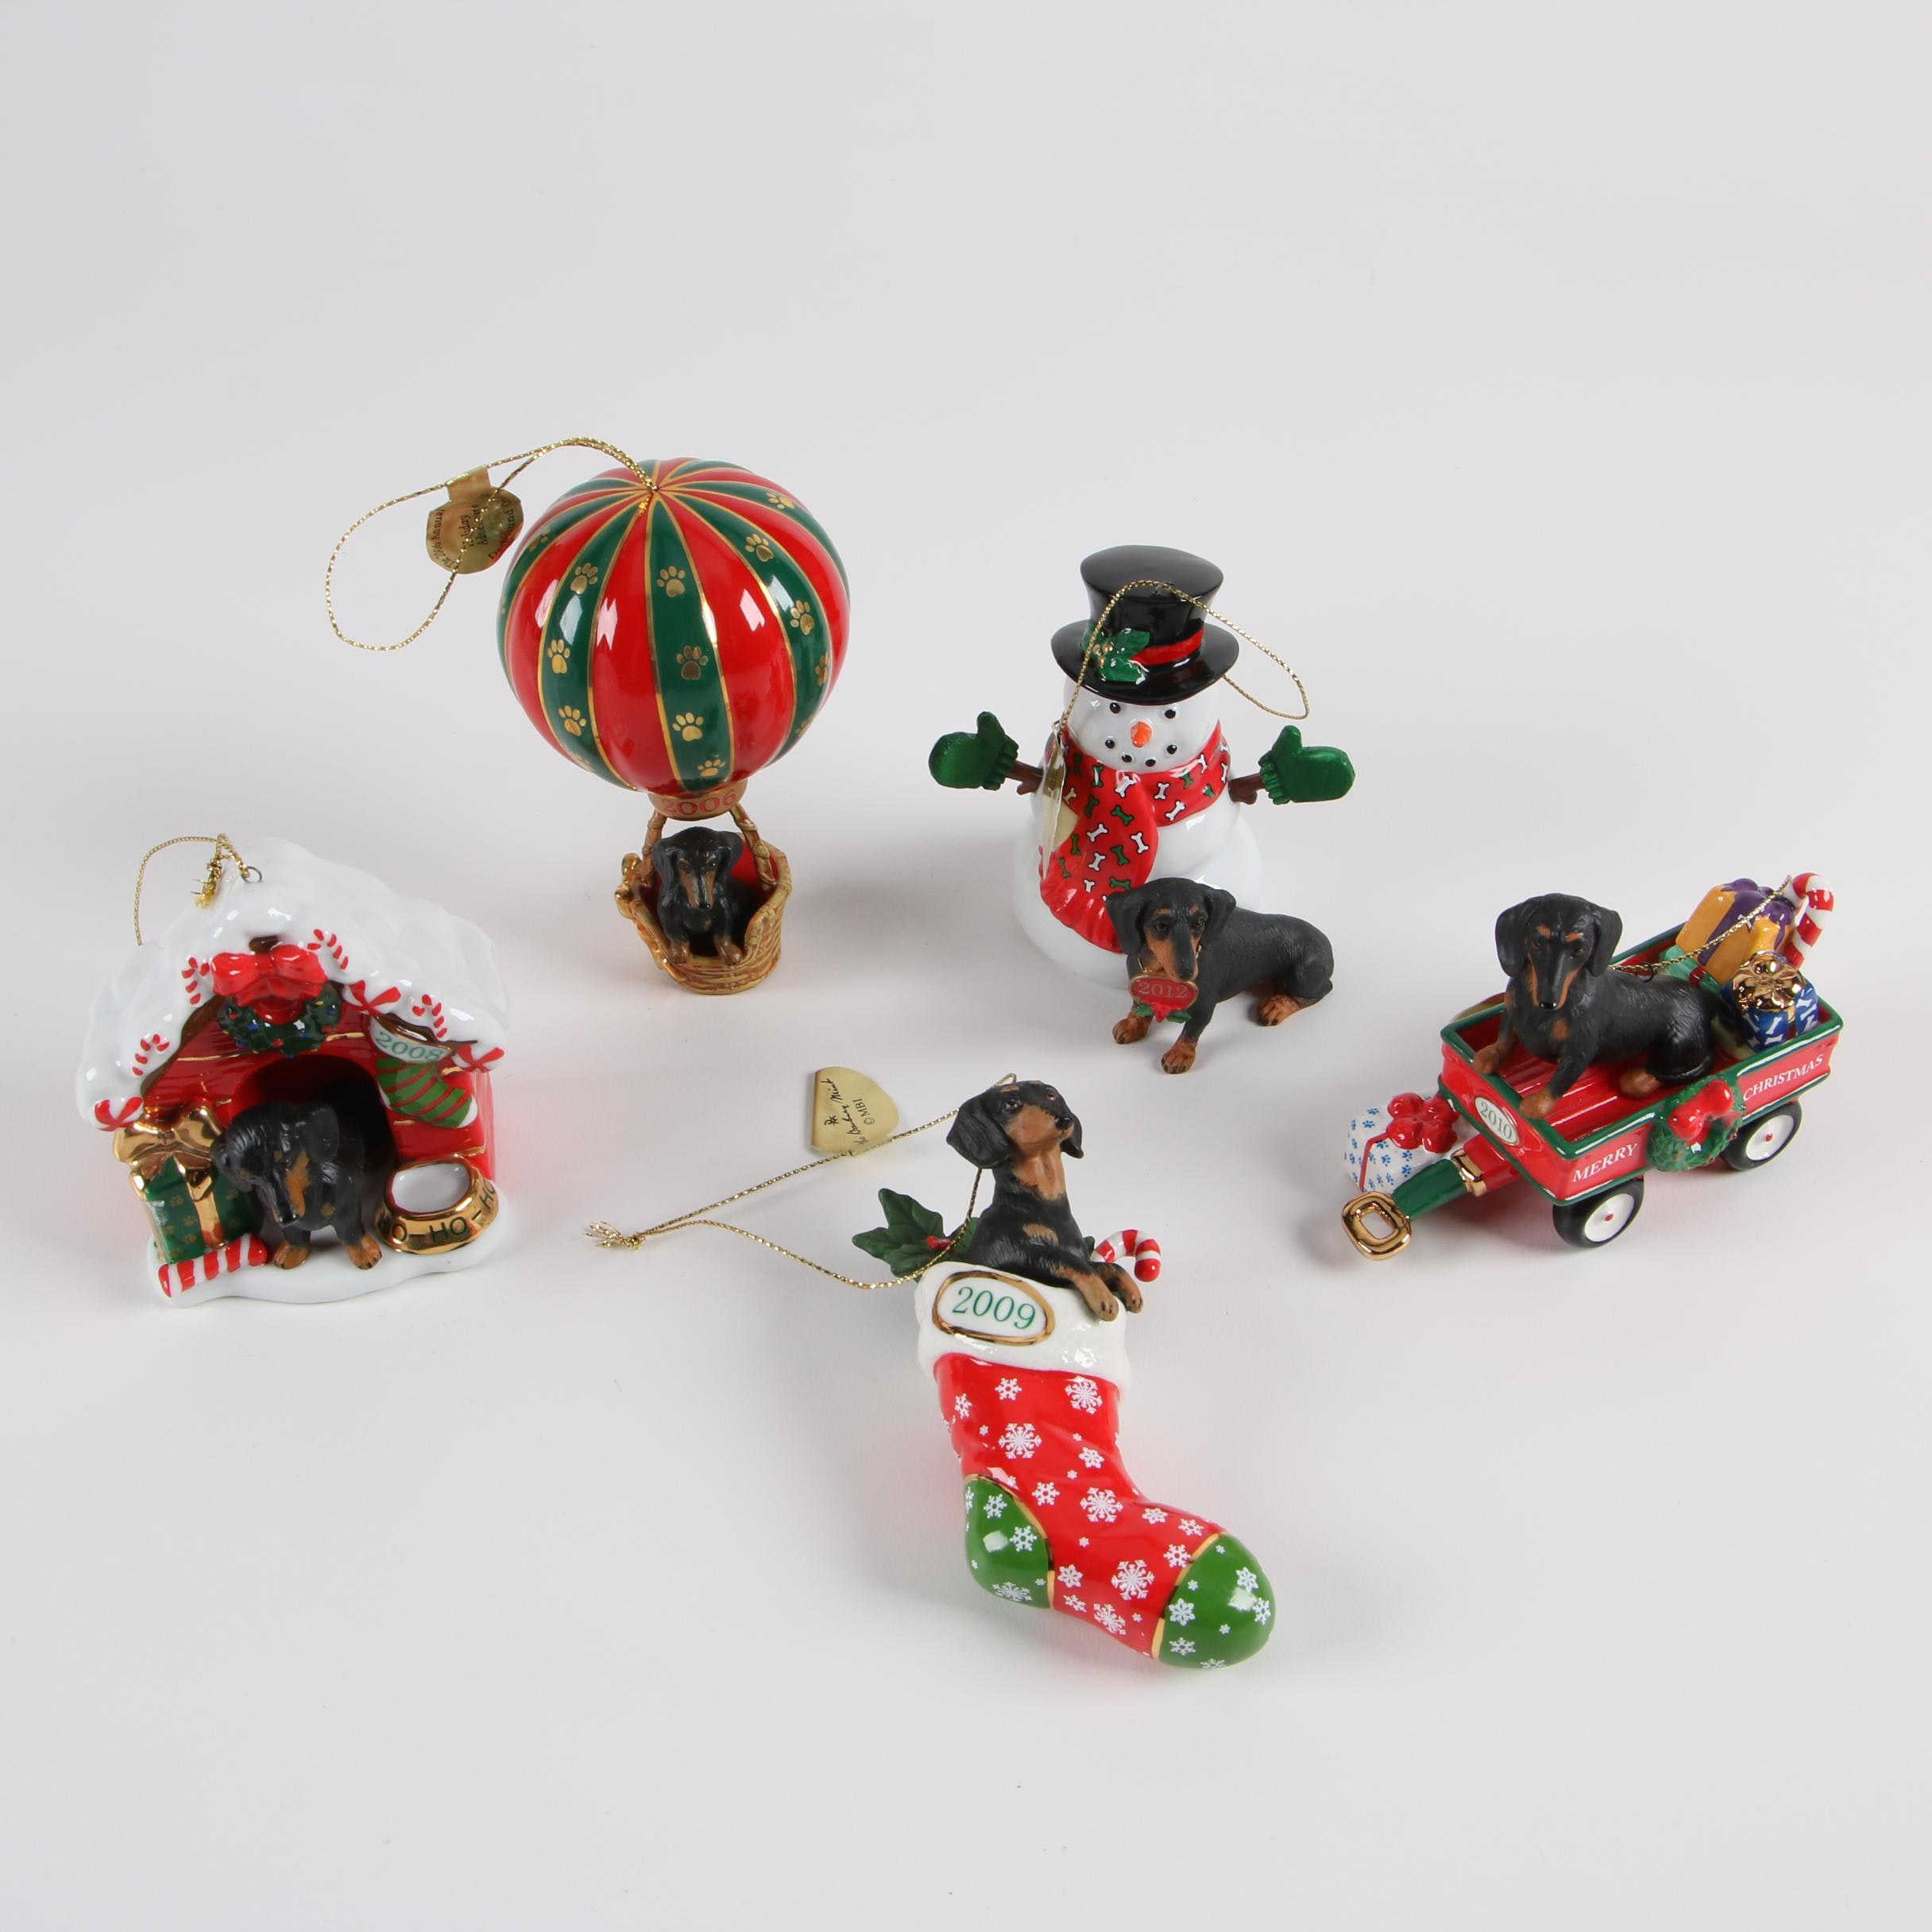 Danbury Mint Annual Porcelain Dachshund Ornaments, 2006-2012